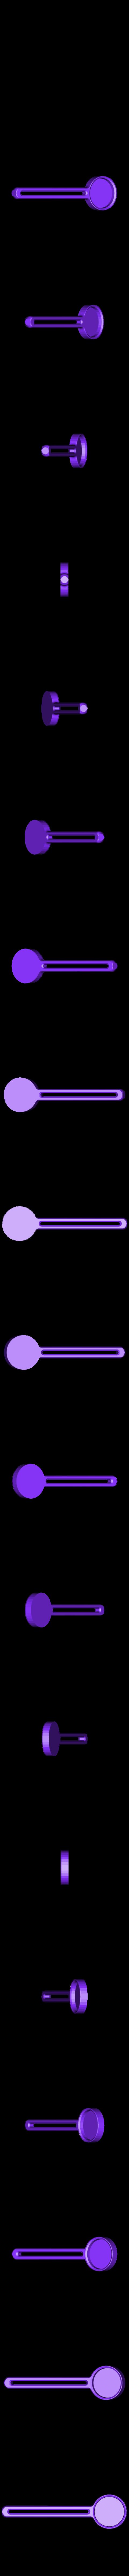 DOSER2ML65MM.stl Download free STL file THE DOSETTE KEY • 3D printable object, JeremyBarbazaStudio